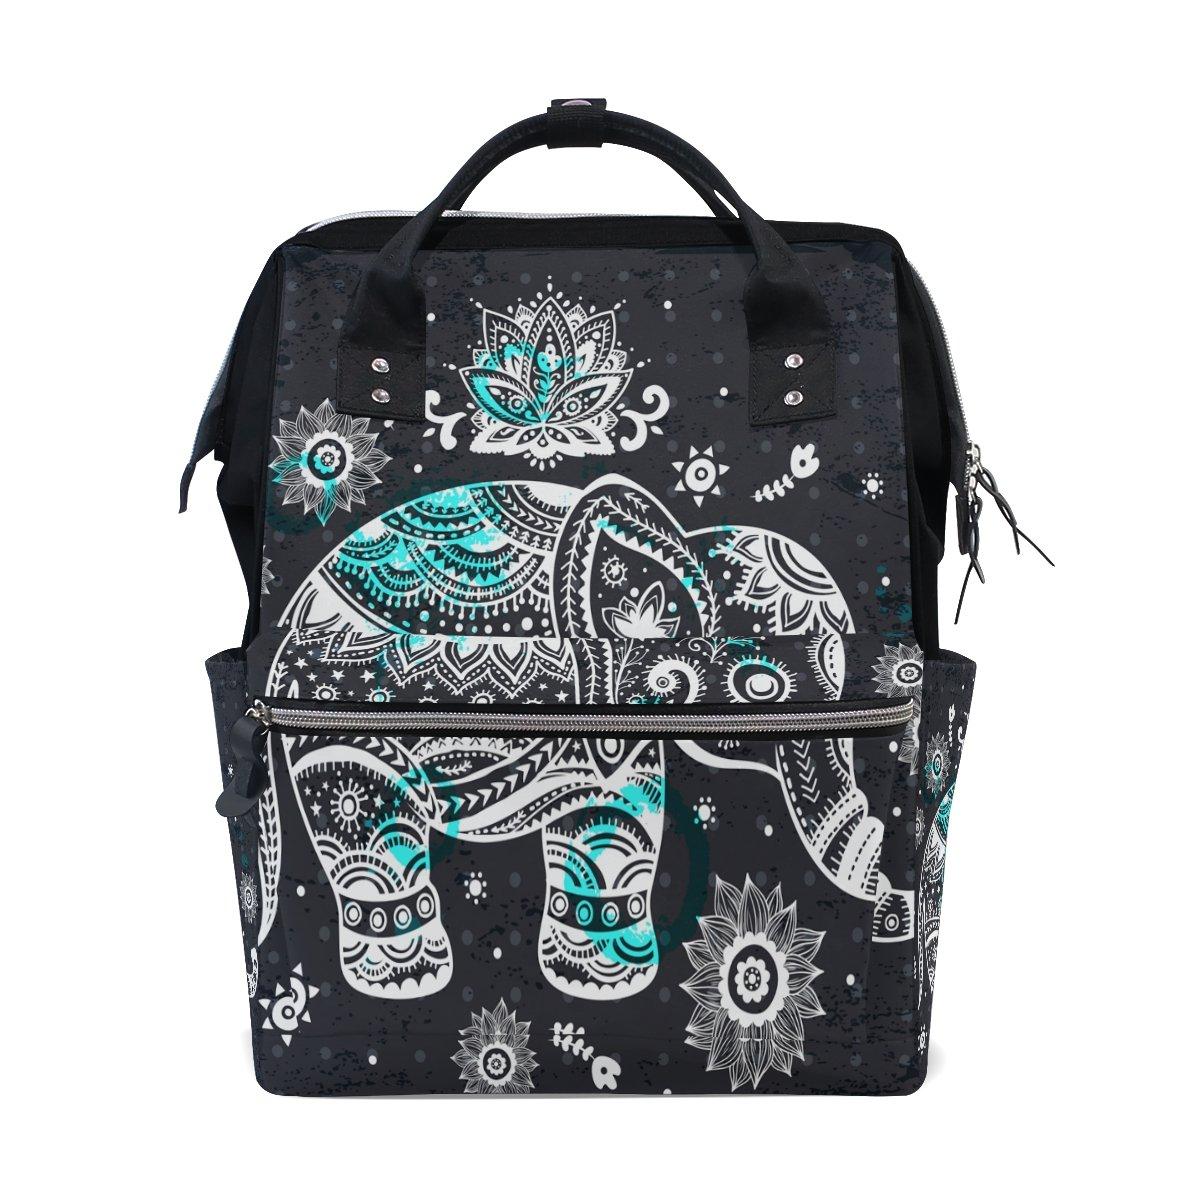 FENNEN Travel Backpack School Laptop Backpack Polka Dot Animal Elephant Large Capacity Shoulder Diaper Bag for Womens Mens